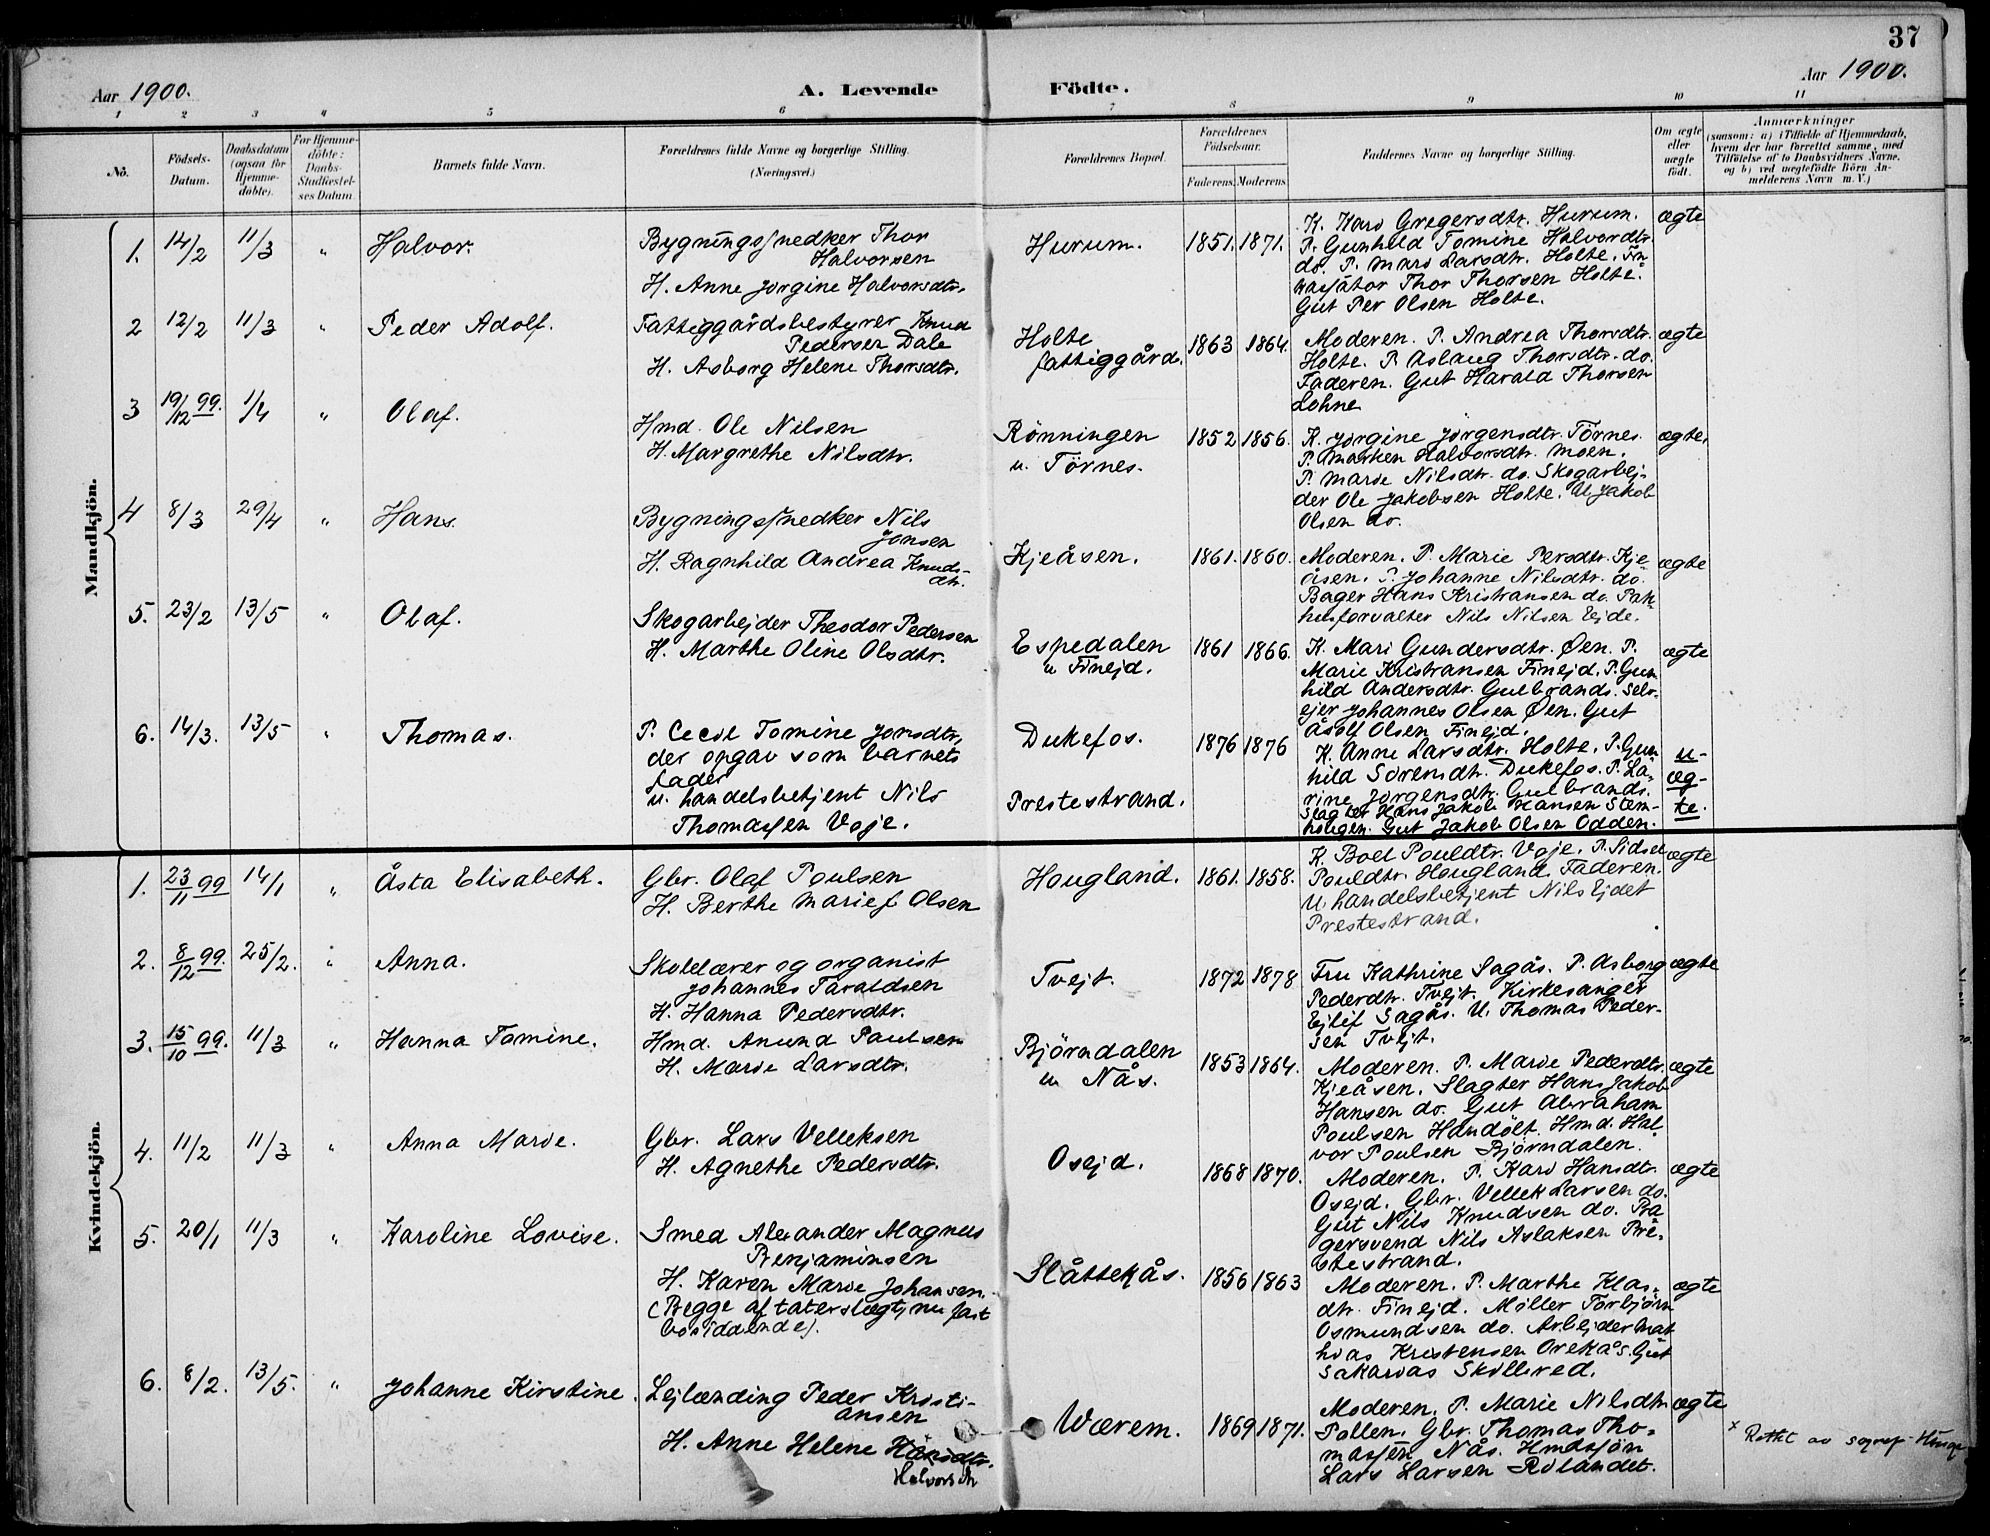 SAKO, Drangedal kirkebøker, F/Fa/L0012: Ministerialbok nr. 12, 1895-1905, s. 37